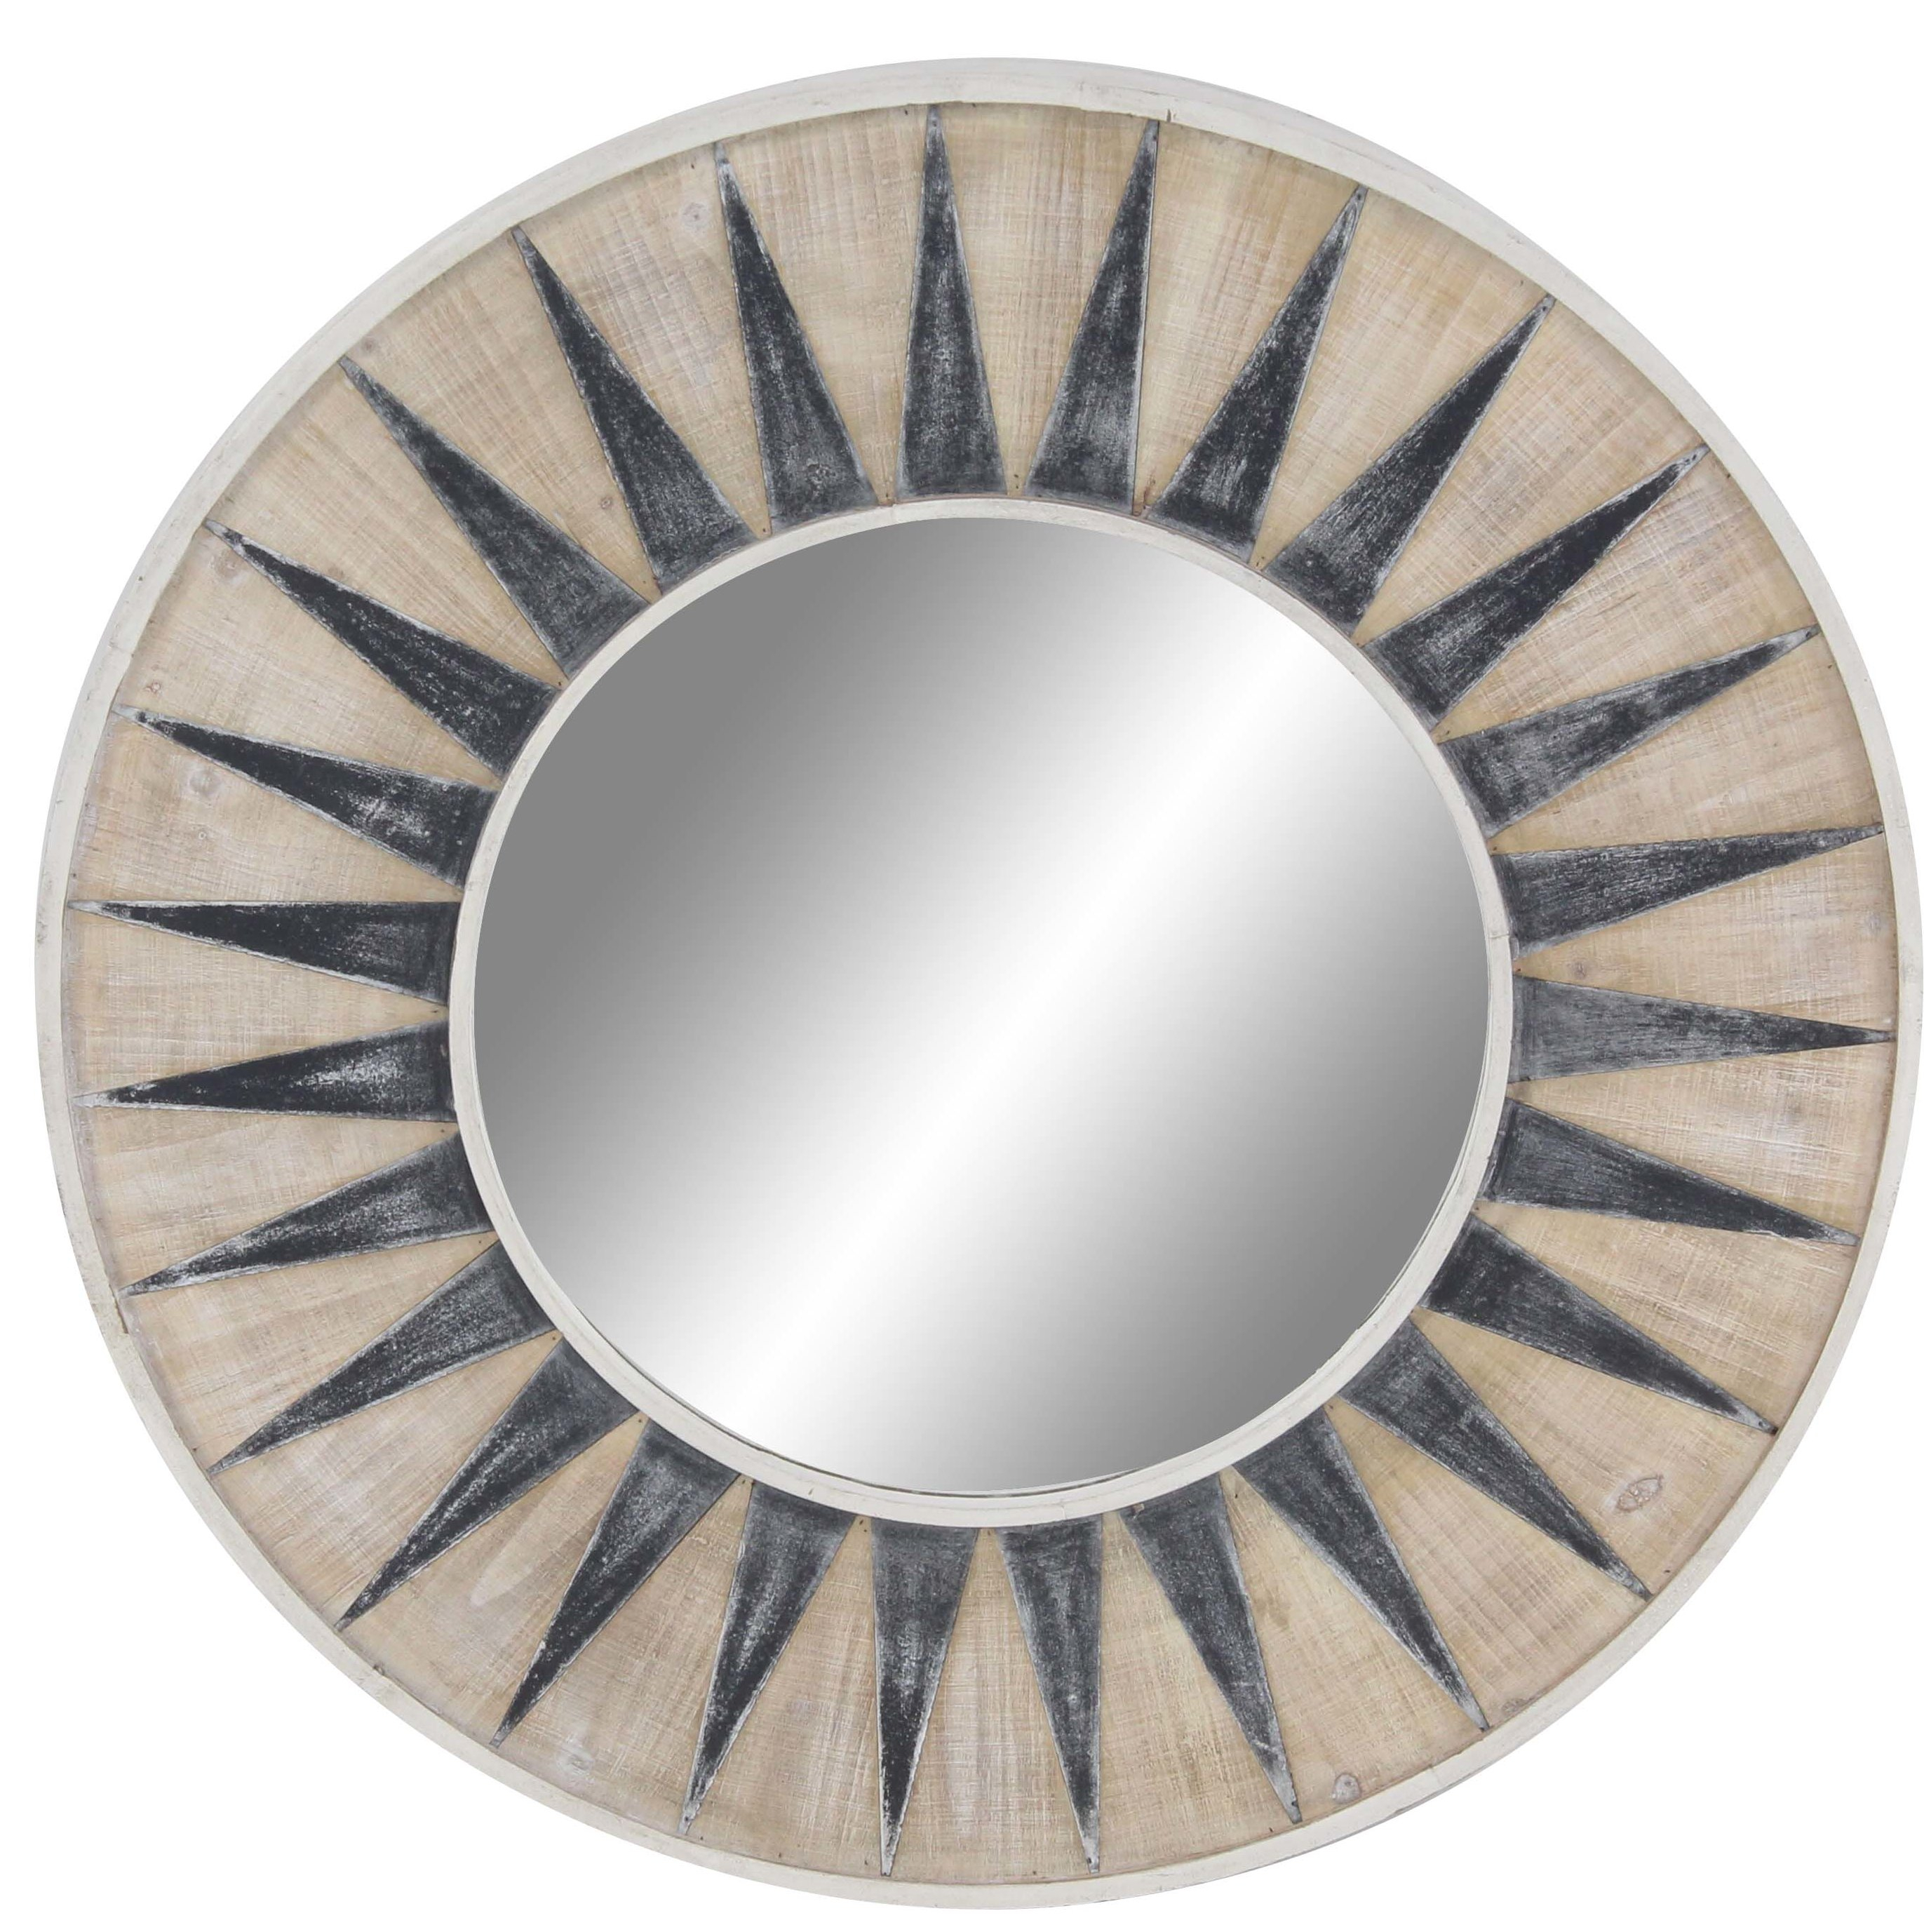 Chessington Modern Sun Themed Accent Mirror Within Estrela Modern Sunburst Metal Wall Mirrors (View 3 of 30)